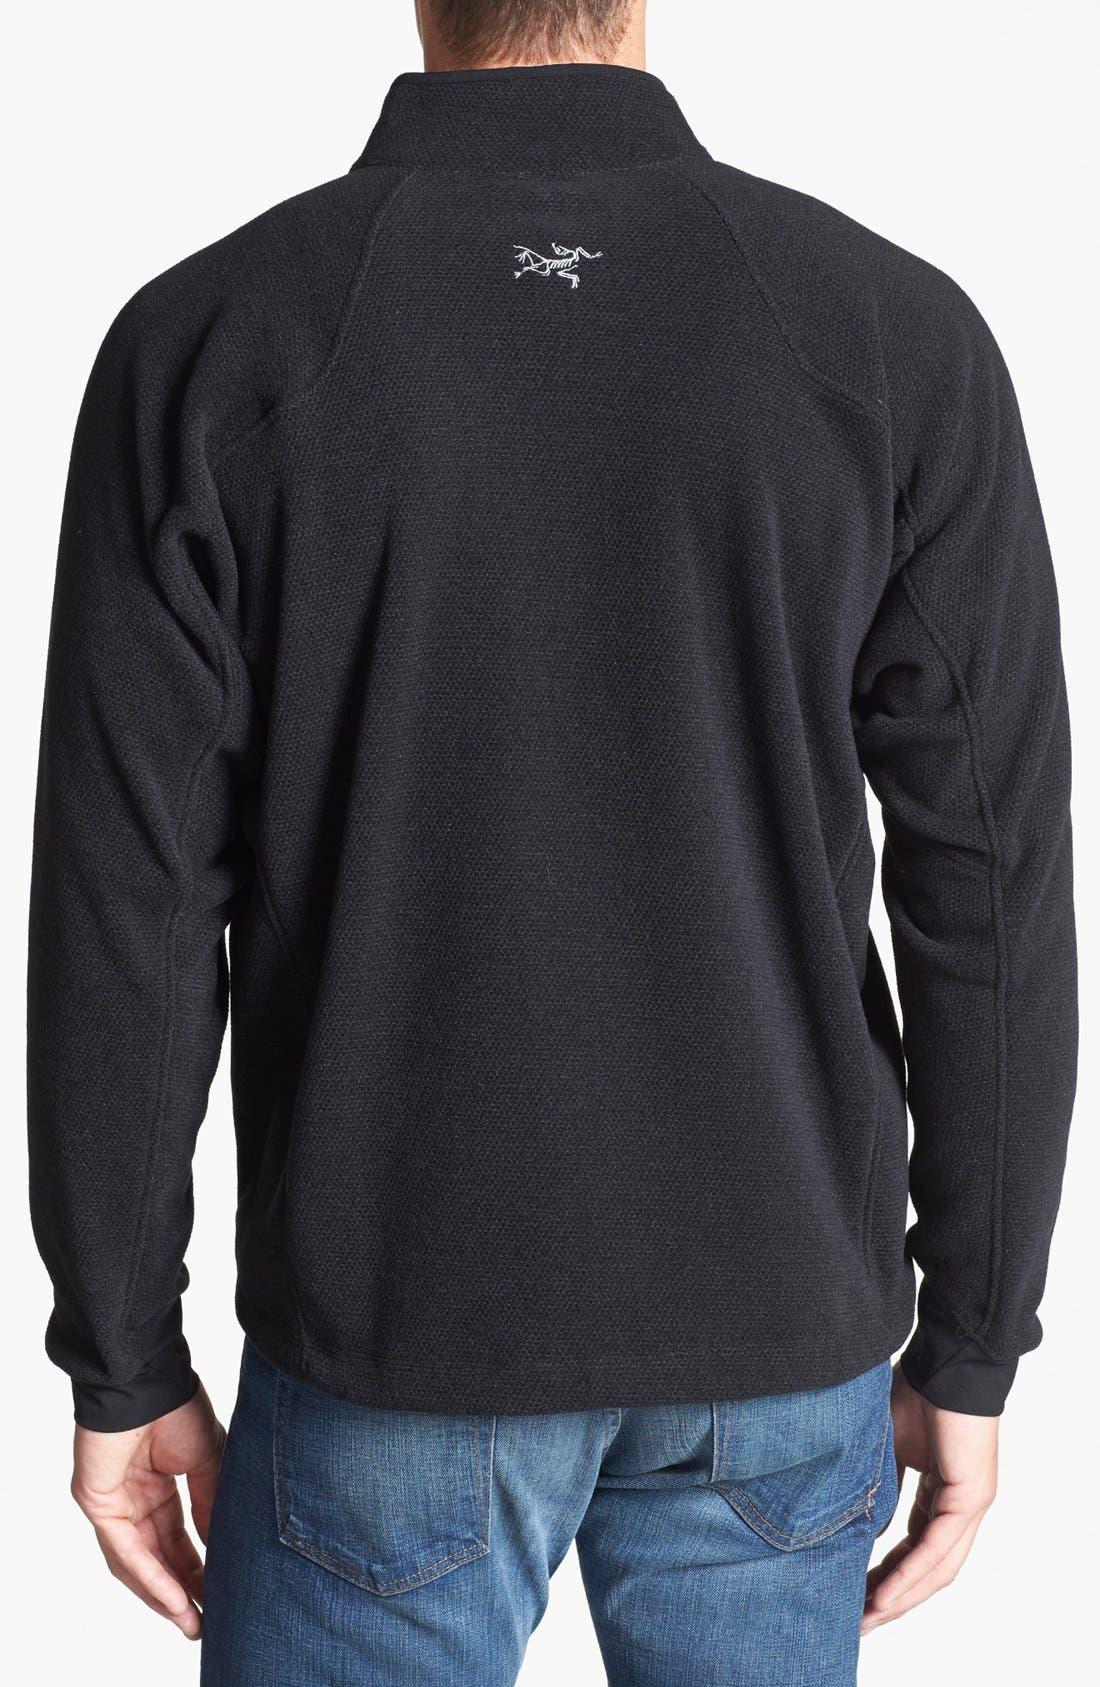 Alternate Image 2  - Arc'teryx 'Strato' Water Repellent Jacket